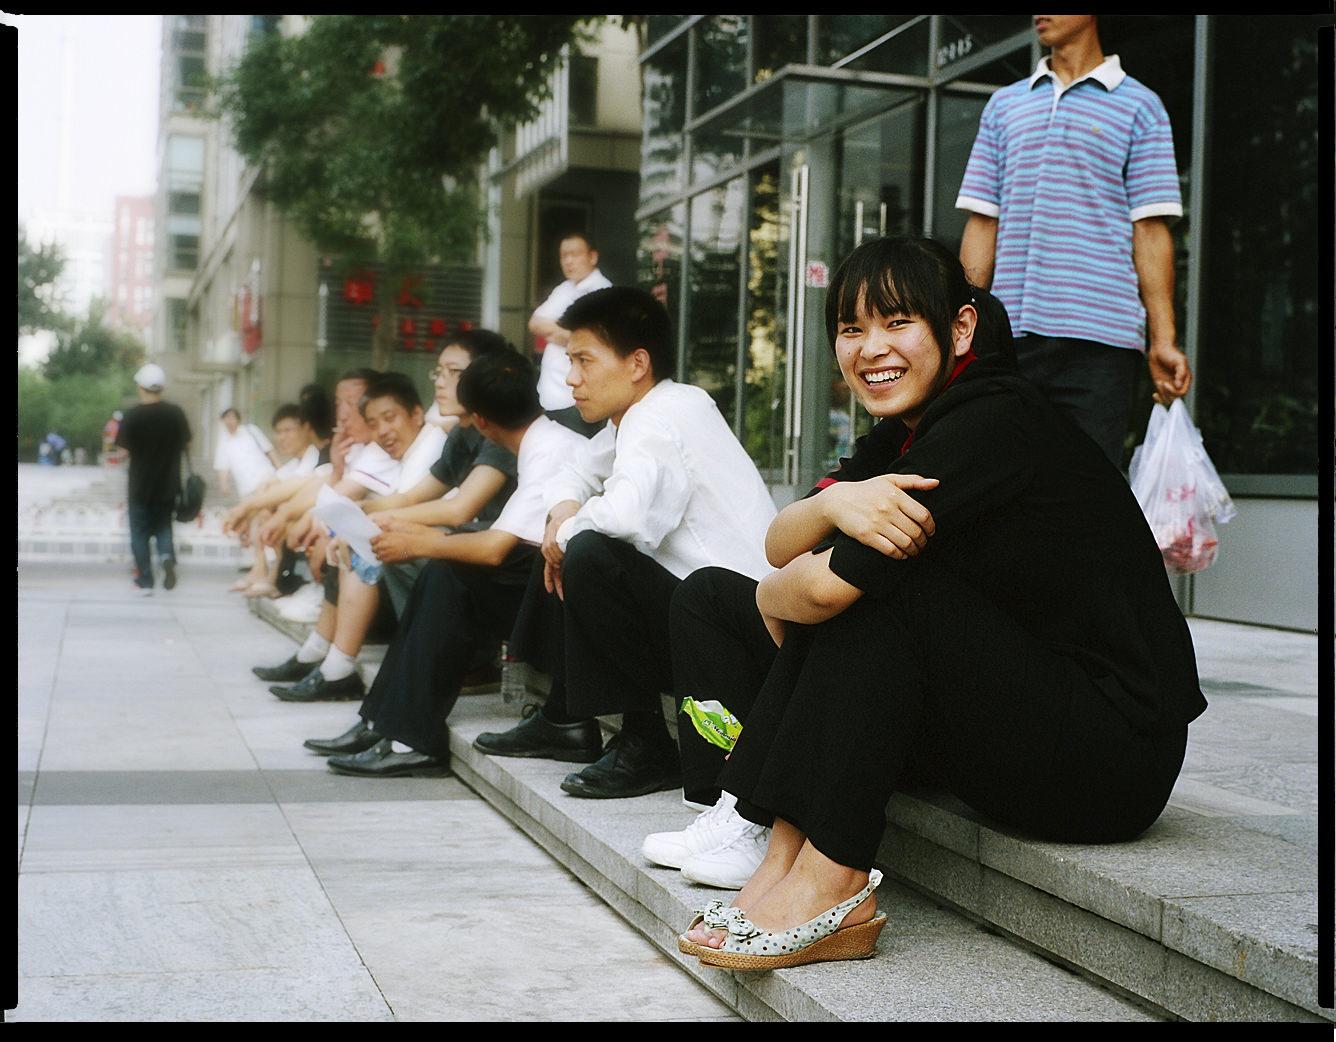 MediumFormatPatrikWallner_Beijing_GirlHappyLOWQ-1